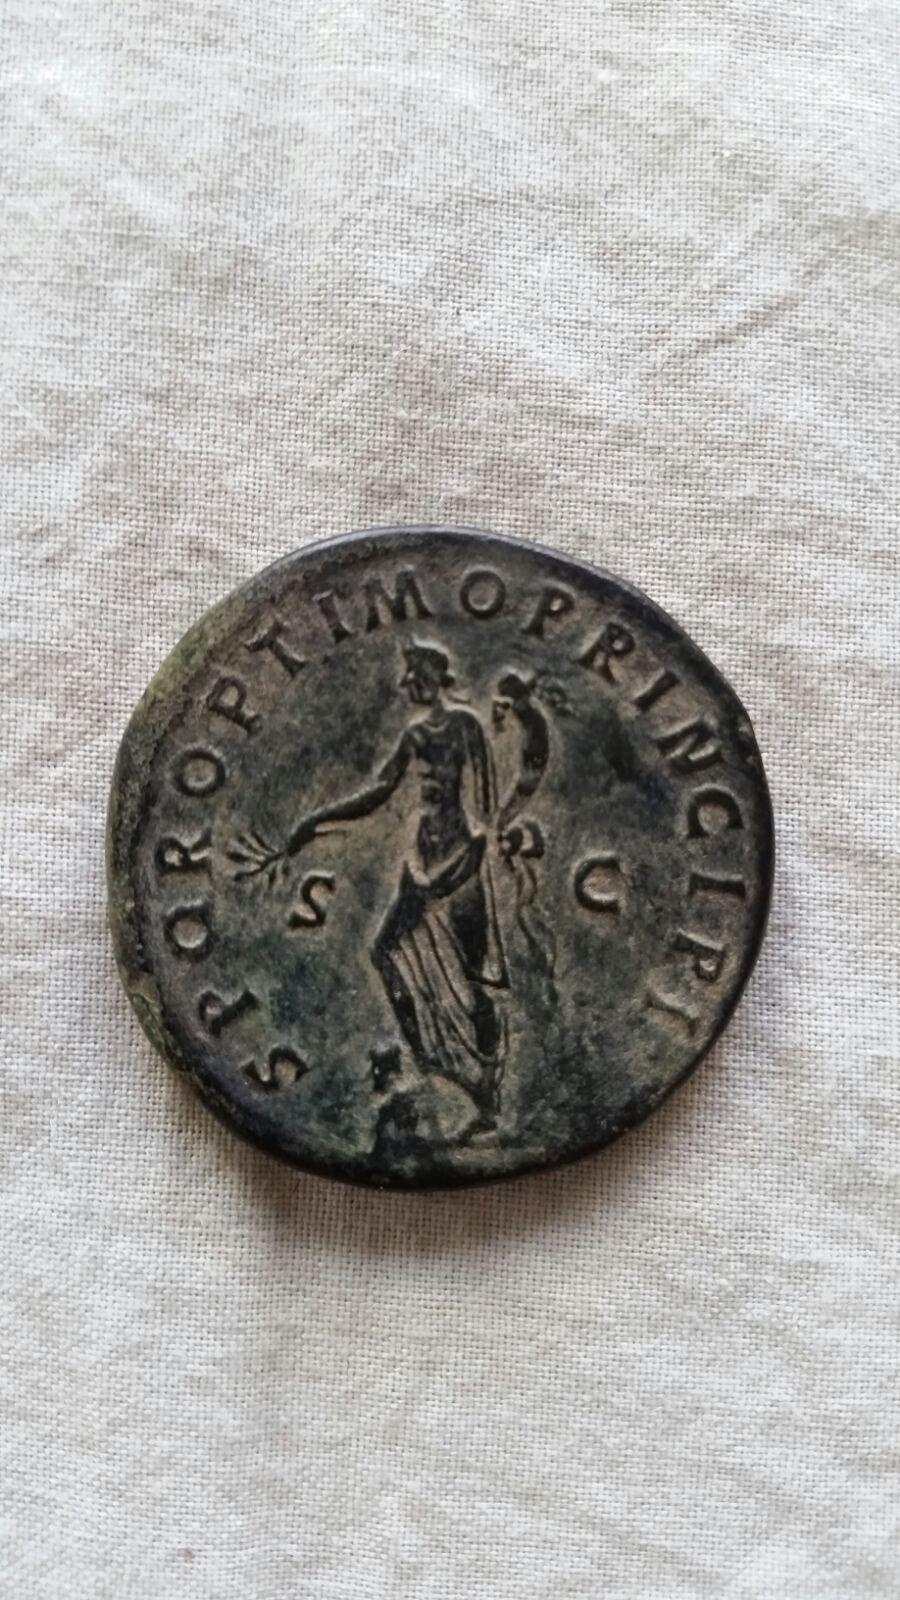 Sestercio de Trajano. SPQR OPTIMO PRINCIPI - S C. Ceca Roma. 5cal3k